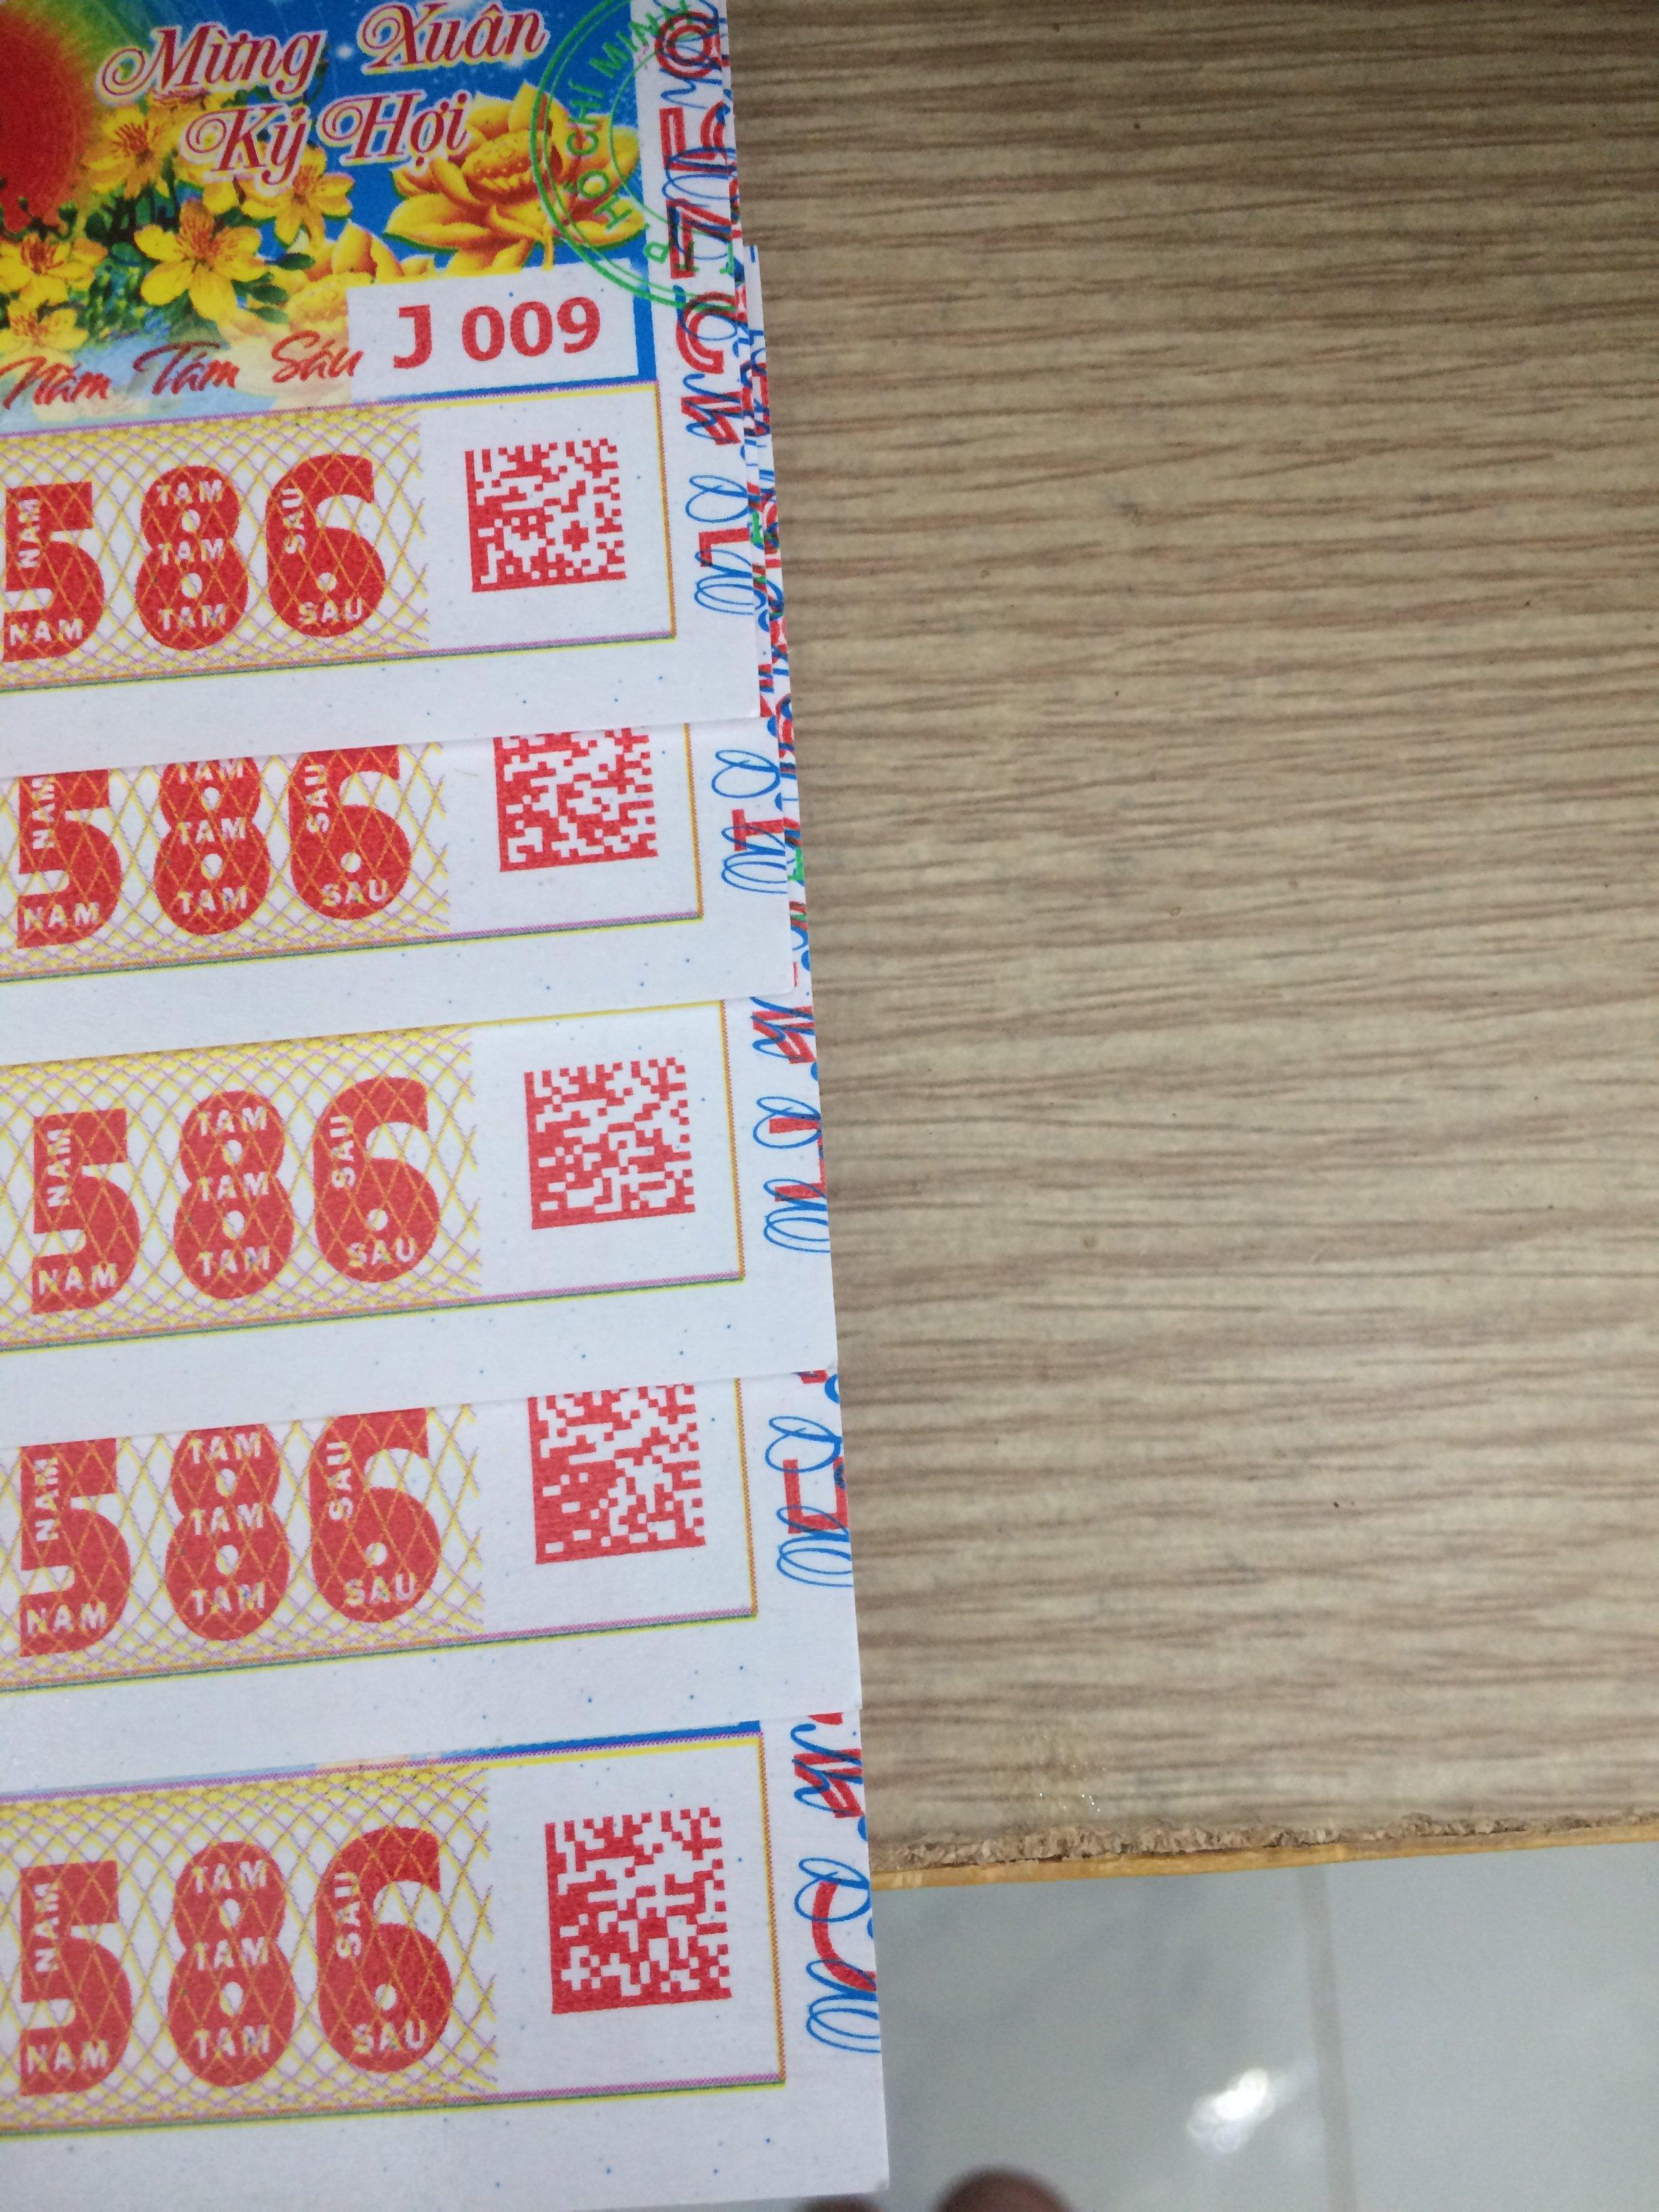 30F4613A-EC15-4F59-90AC-D220E5E34D6F.jpeg